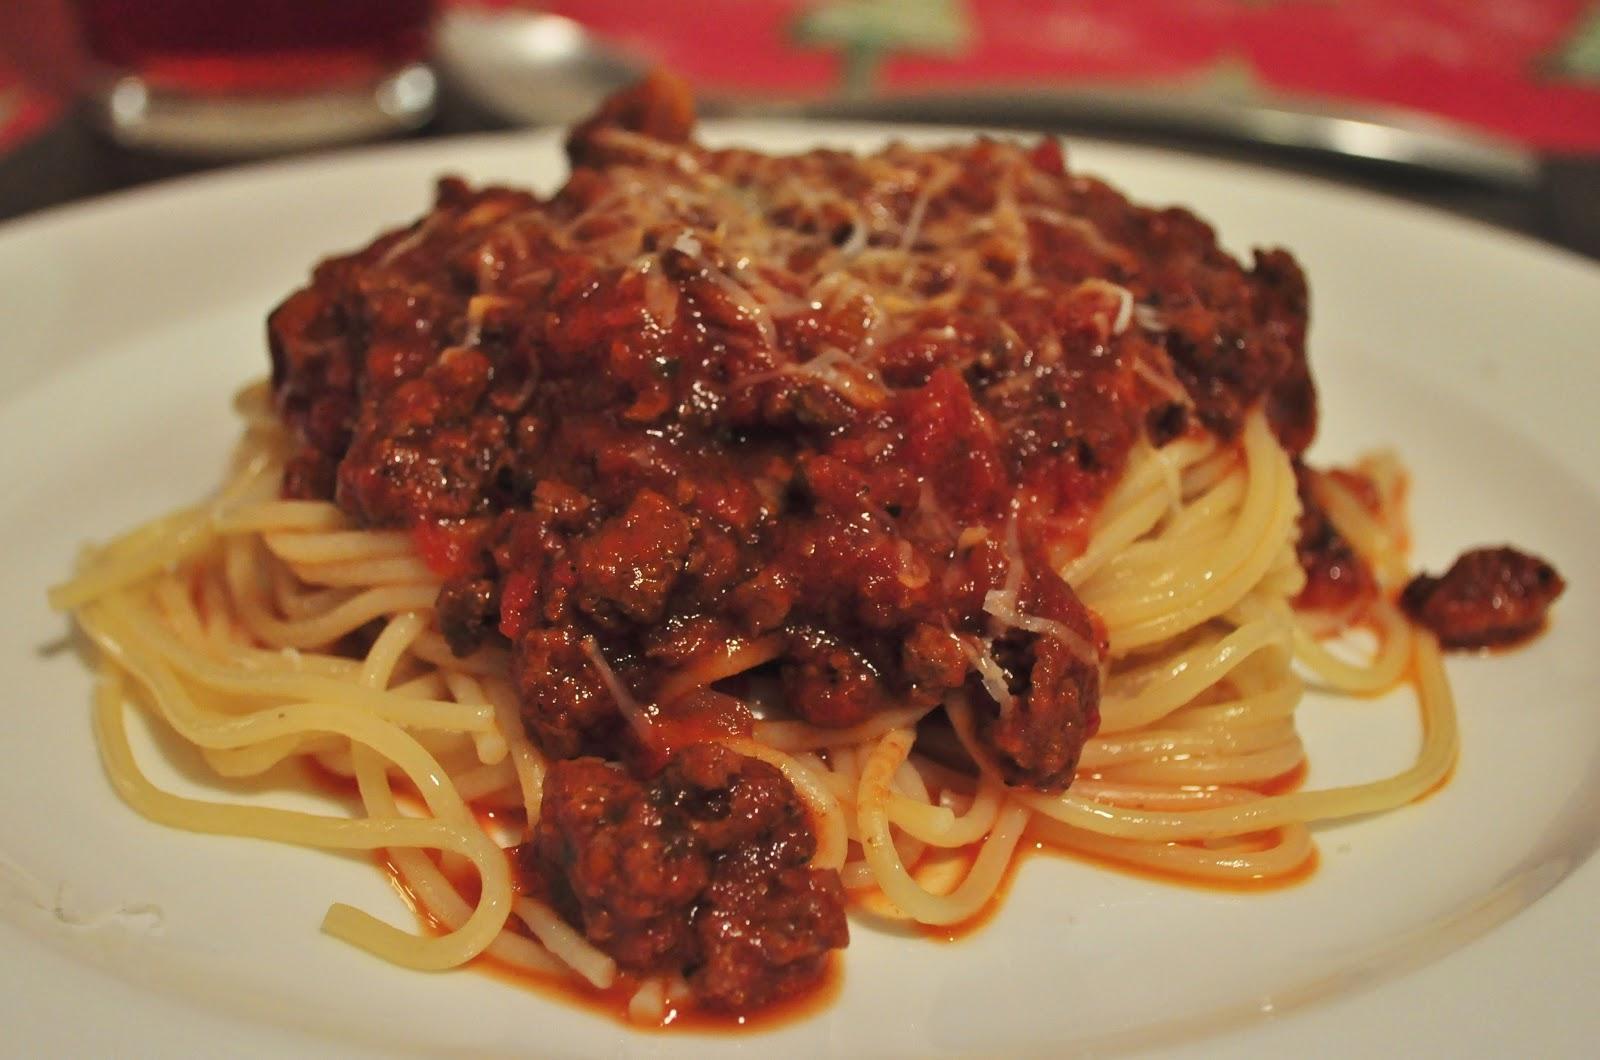 quick spaghetti sauce nanny s spaghetti sauce divine spaghetti sauce ...